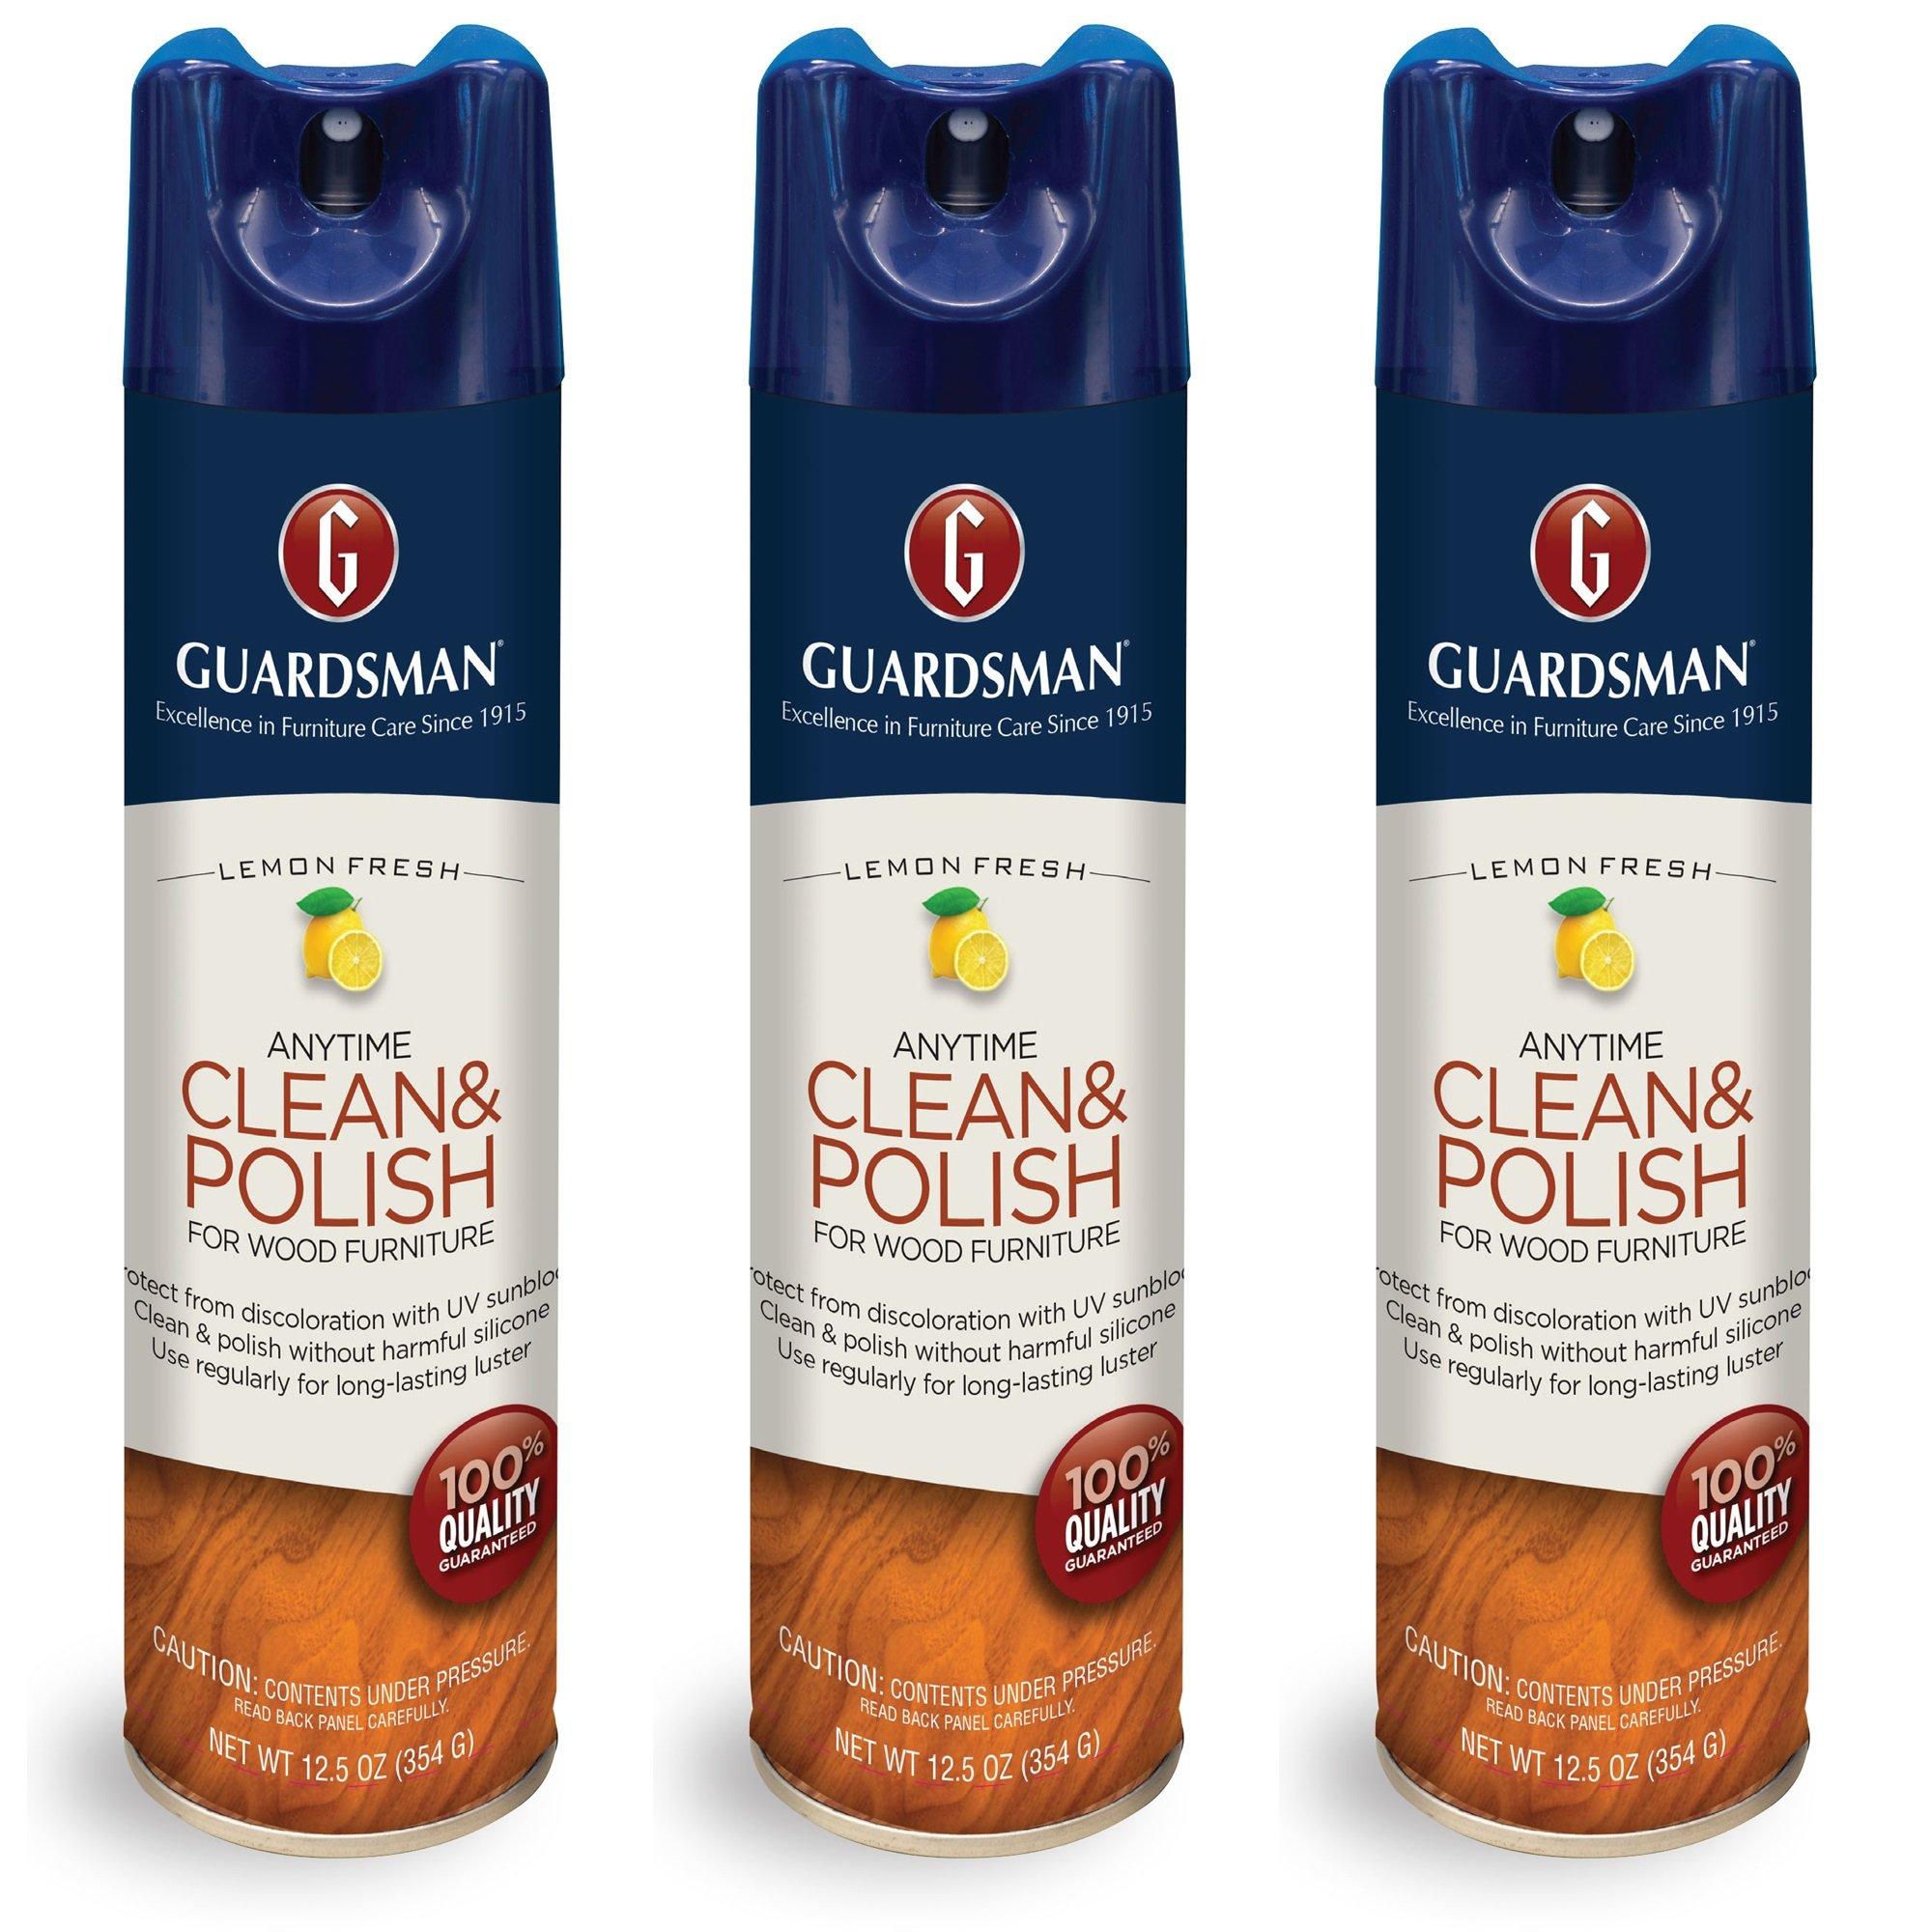 Guardsman Clean & Polish for Wood Furniture - LemonFresh - 12.5 oz, 3- Count - Silicone Free, UV Protection